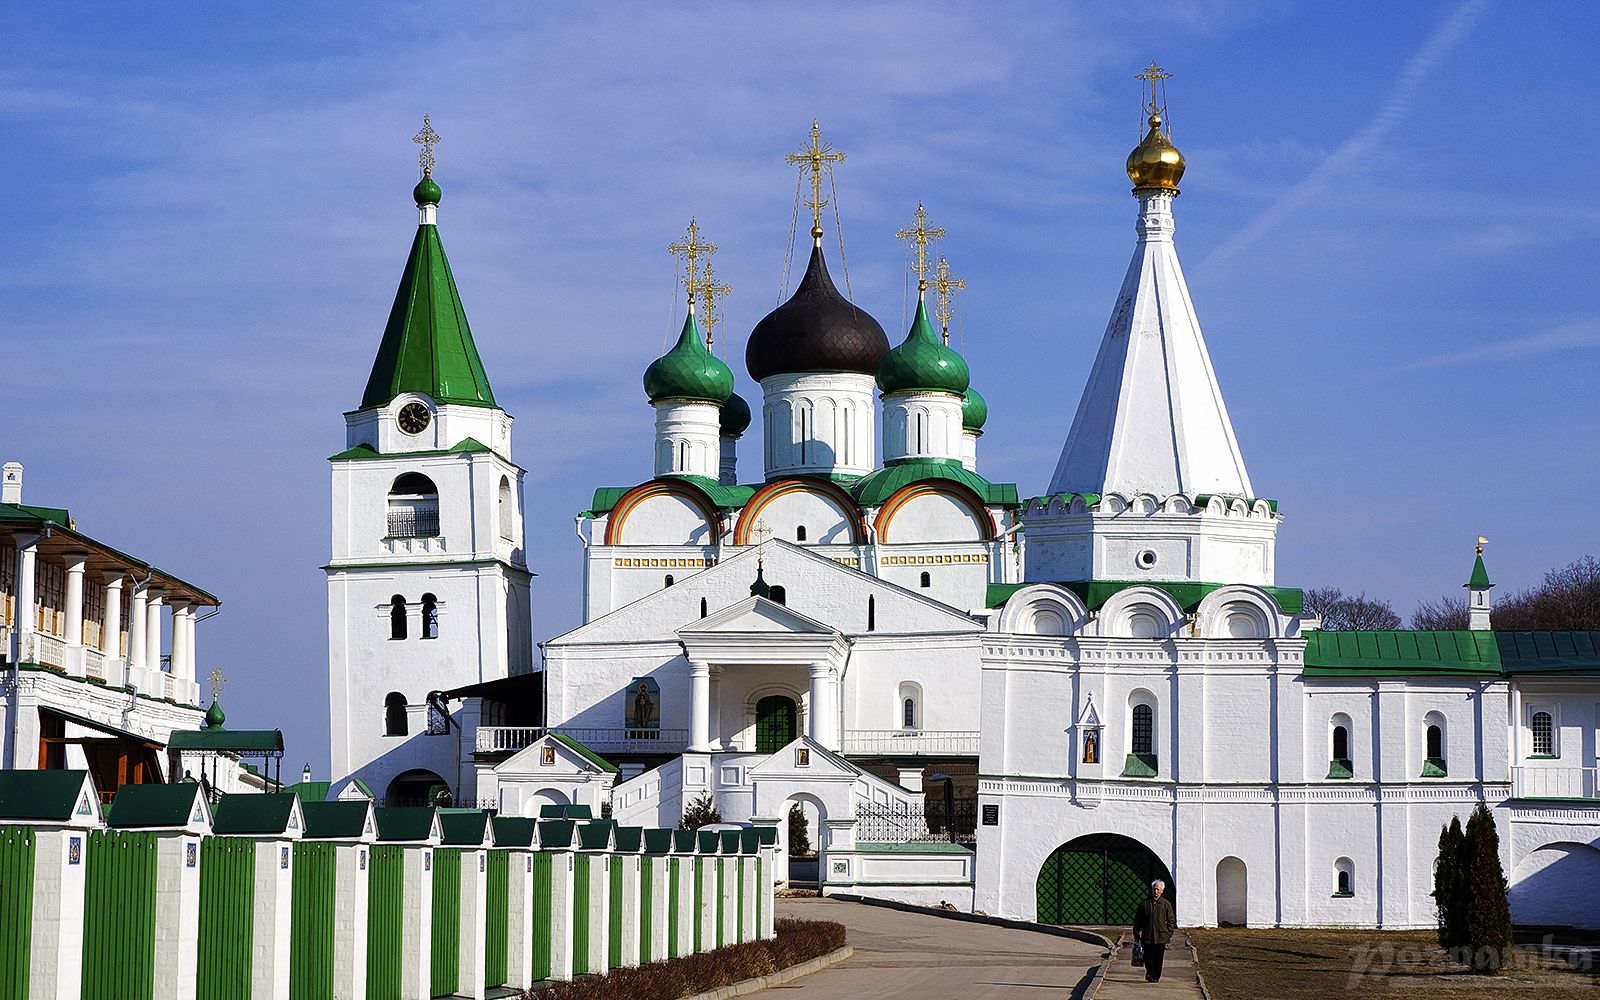 Печёрский монастырь (Нижний Новгород)